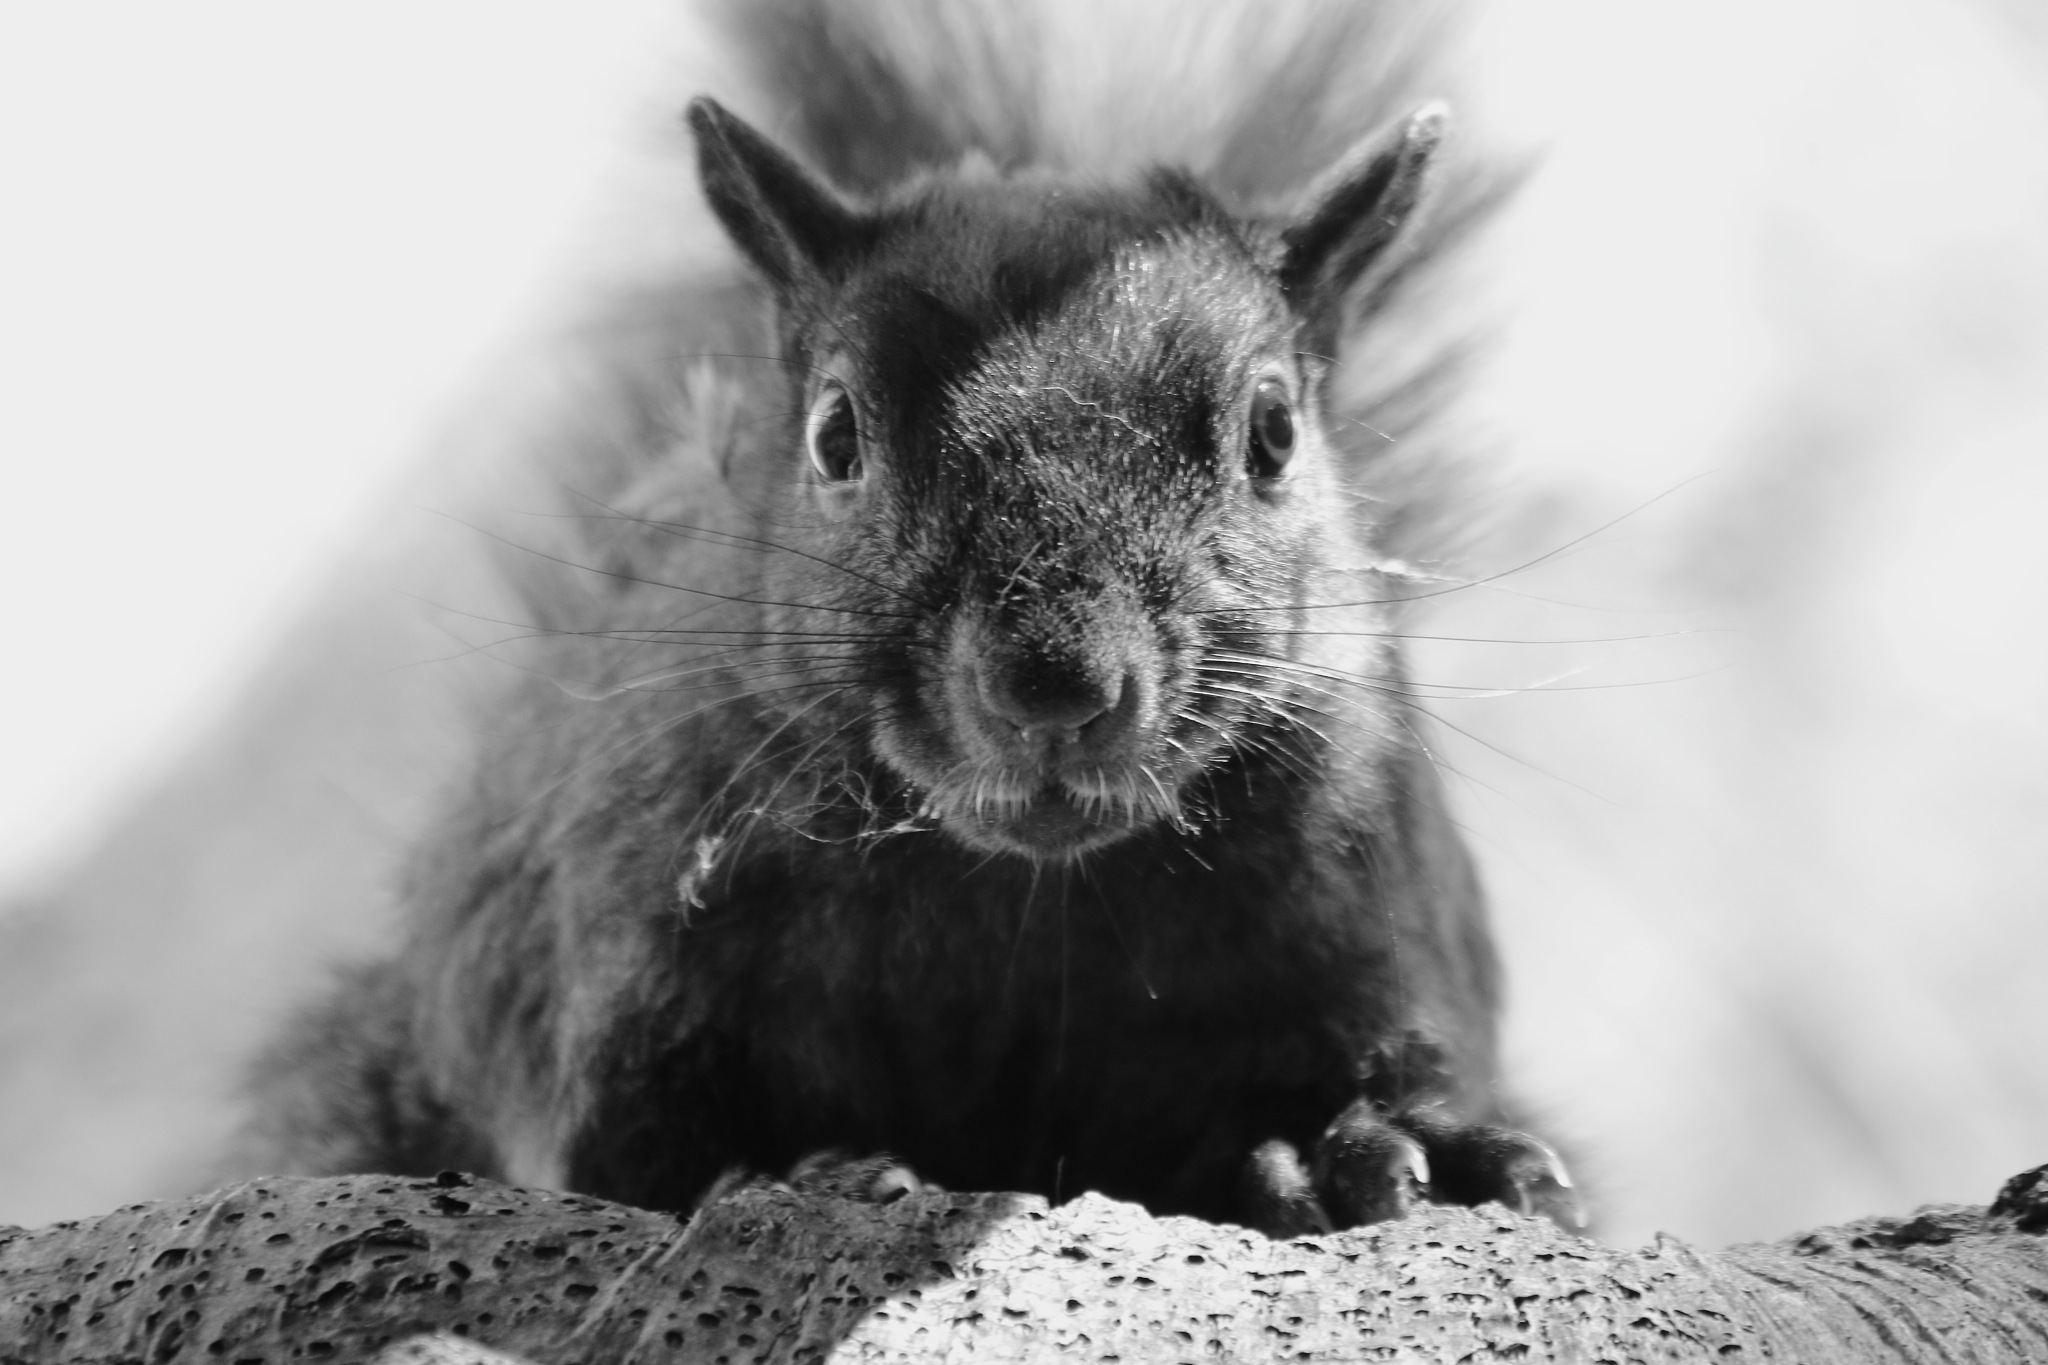 Squirrel by thurd